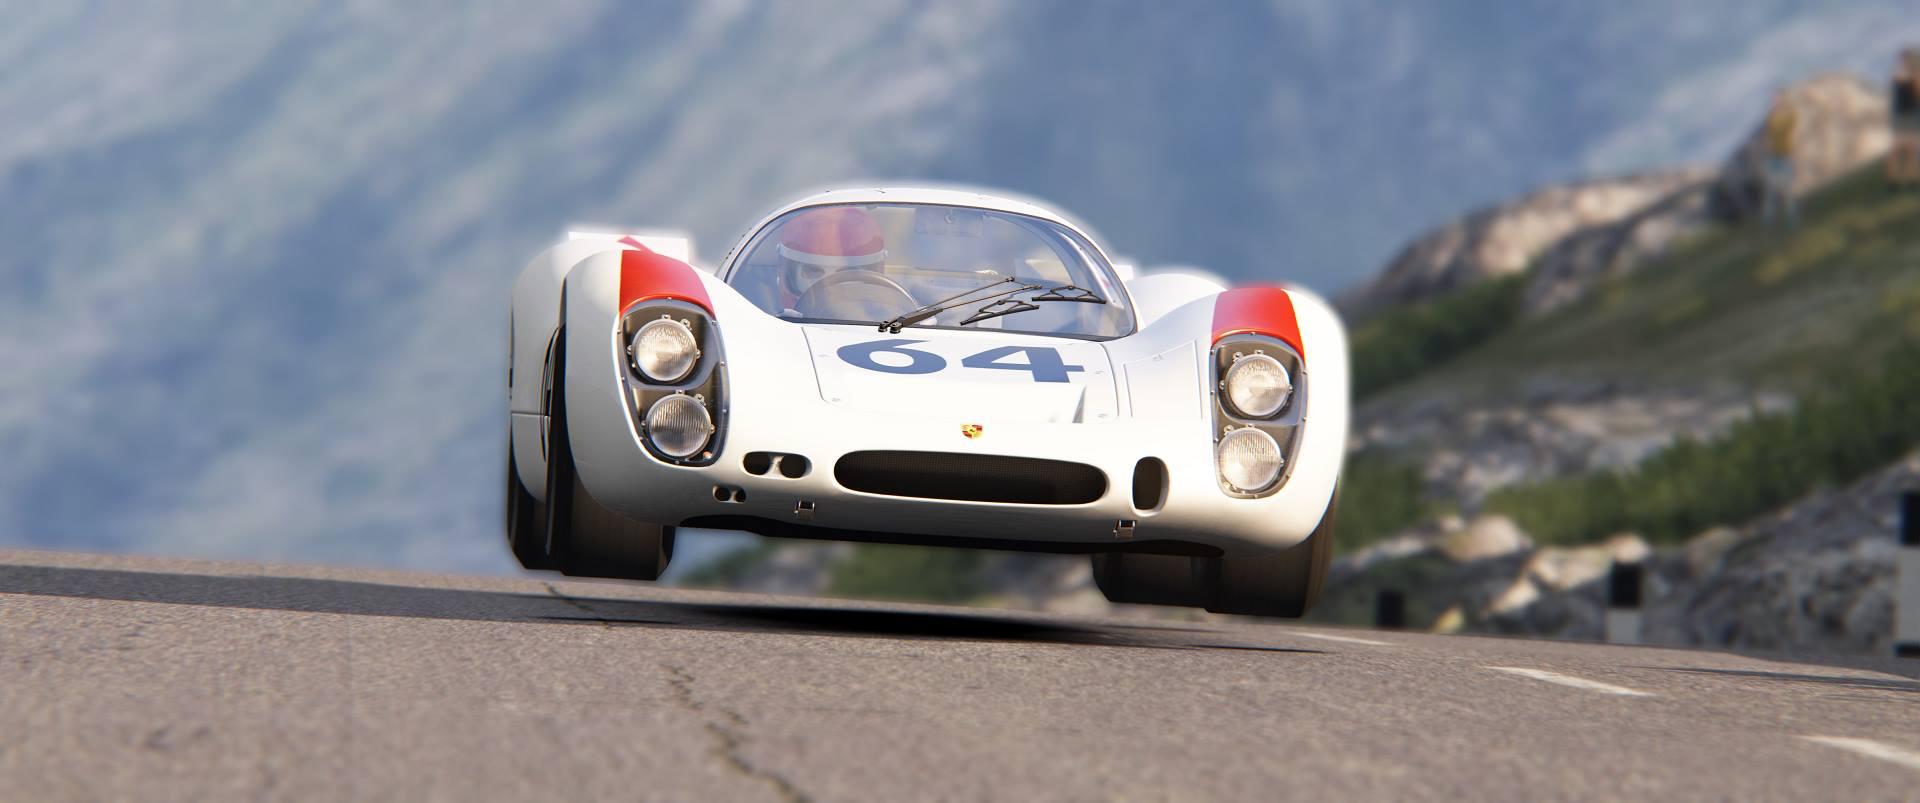 Assetto Corsa Porsche Vol. 3 DLC 5.jpg